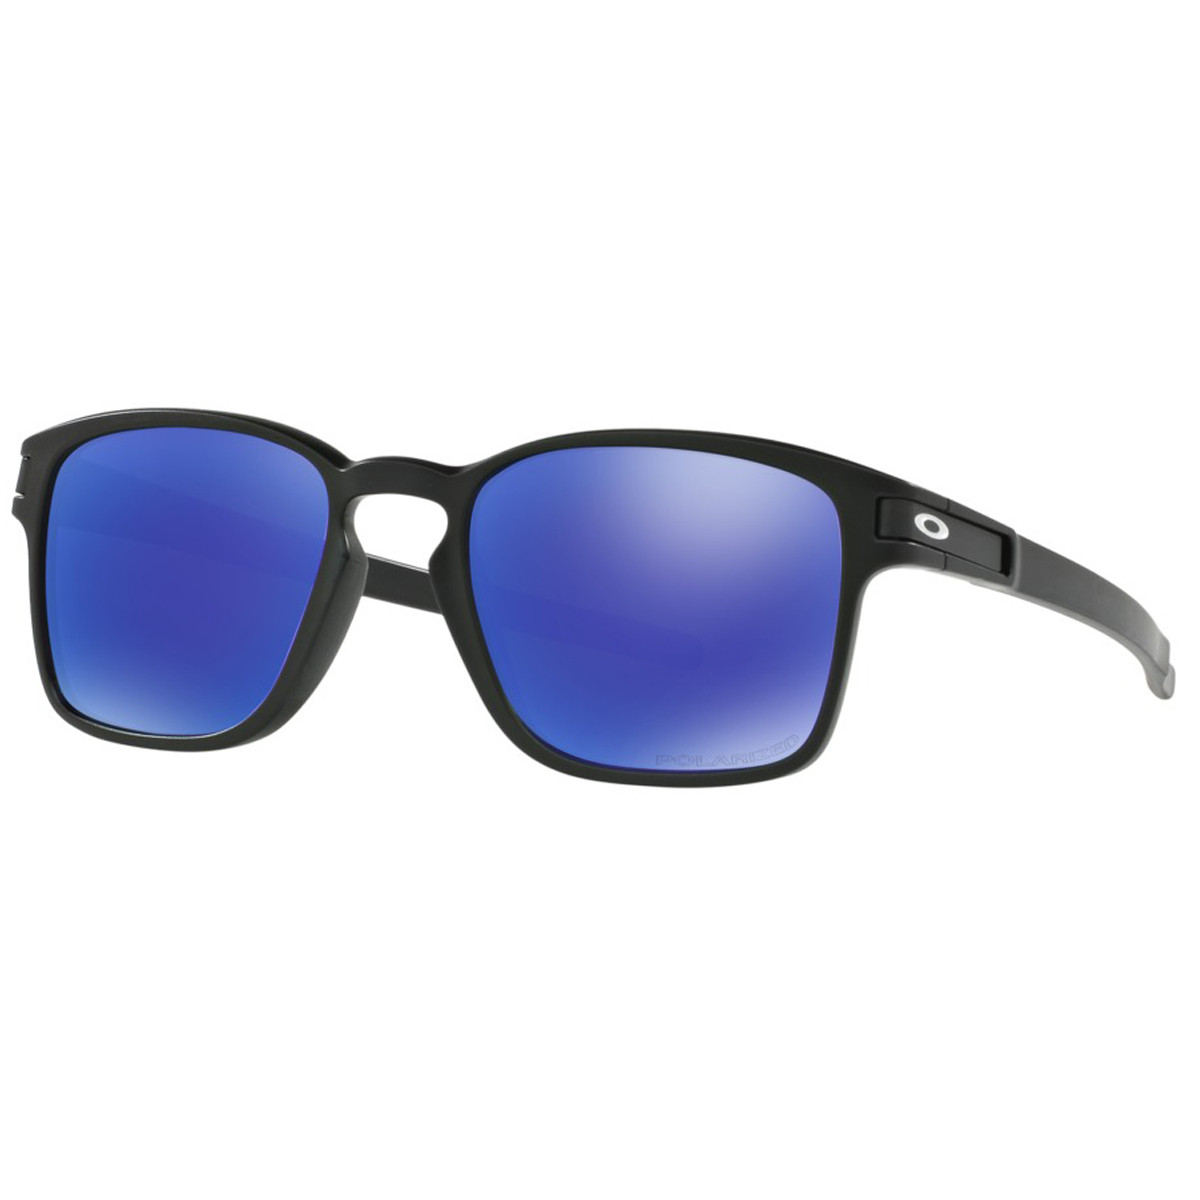 1f5855b7ff836 Óculos Oakley Latch Square Matte Black  Lente Violet Iridium Polarizado